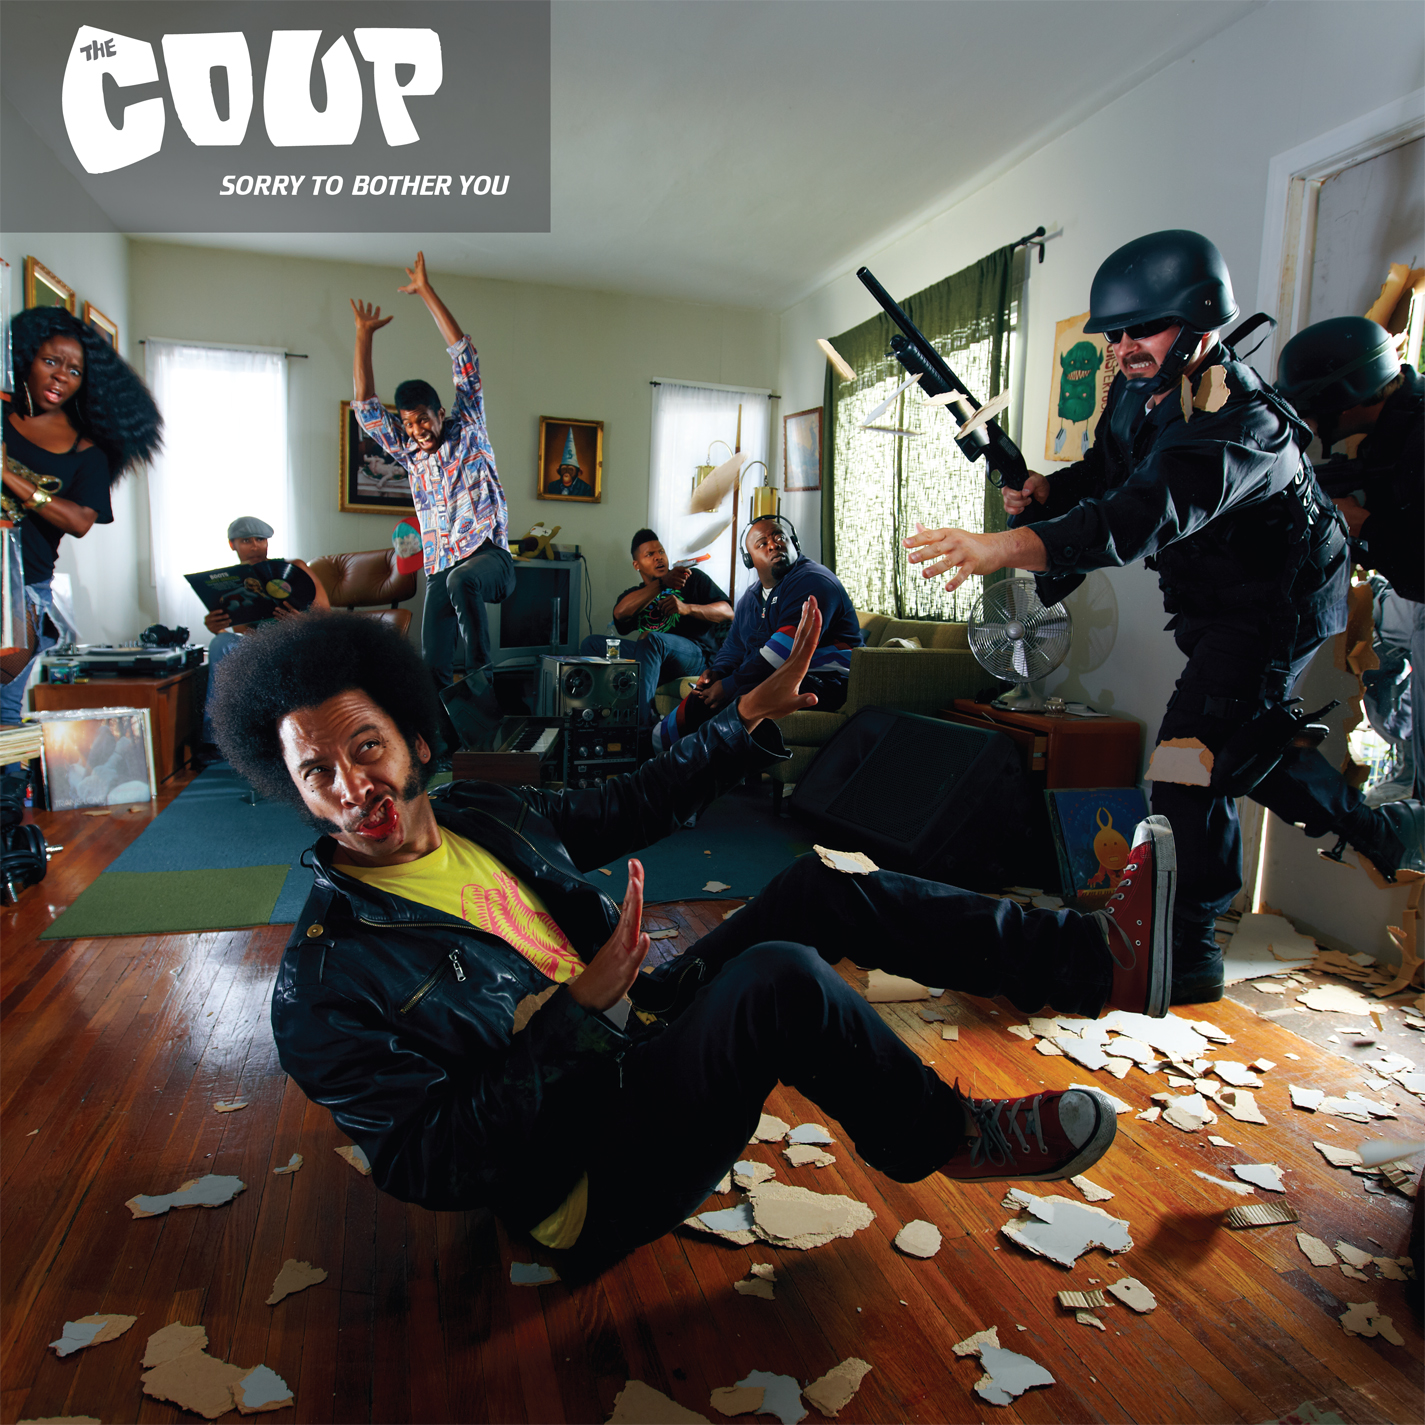 The Coup - WAVIP ft. Das Racist & Killer Mike [audio]